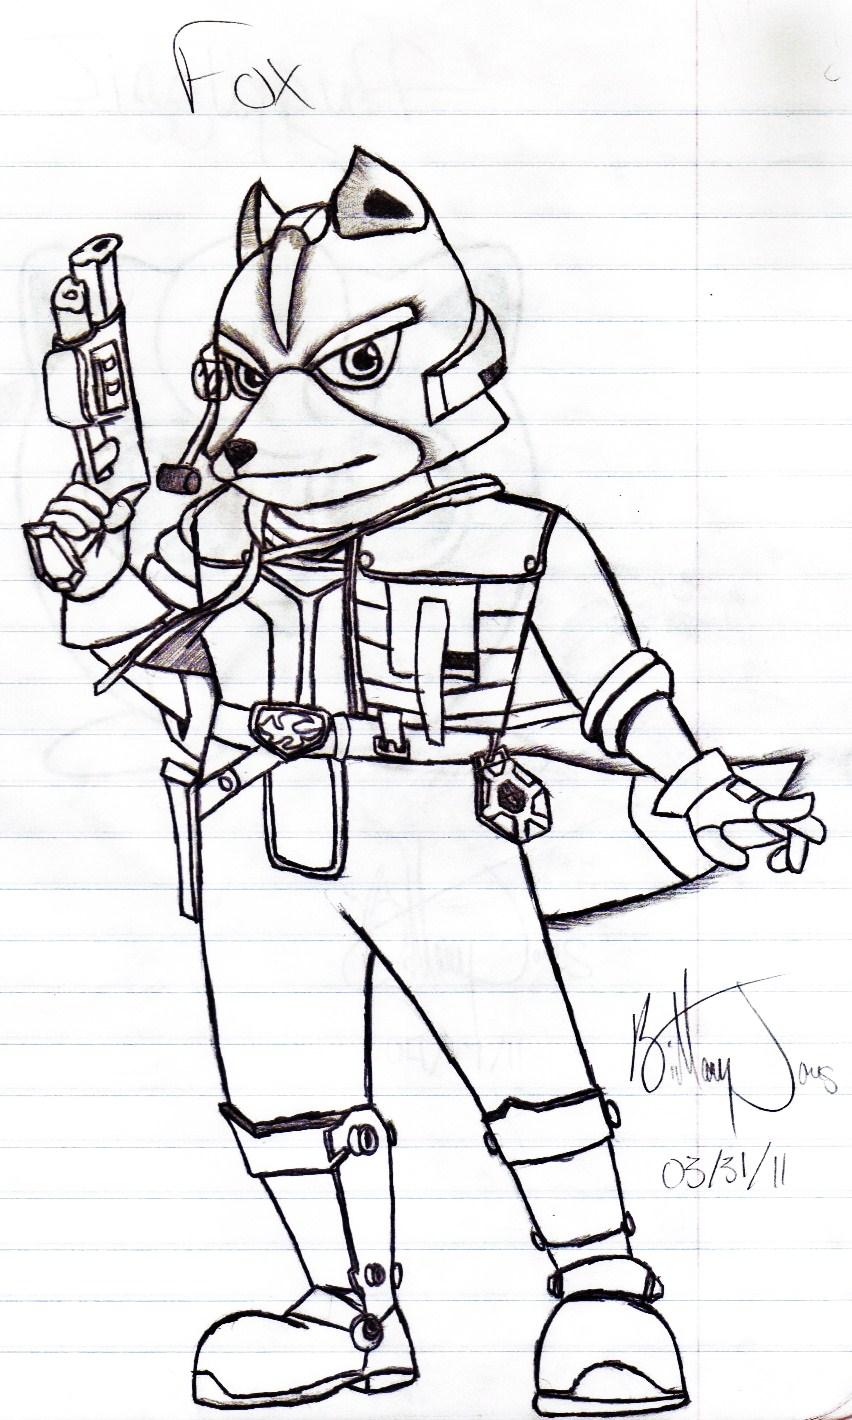 Super smash bros brawl fox by badasssheik92 on deviantart for Super smash bros brawl coloring pages